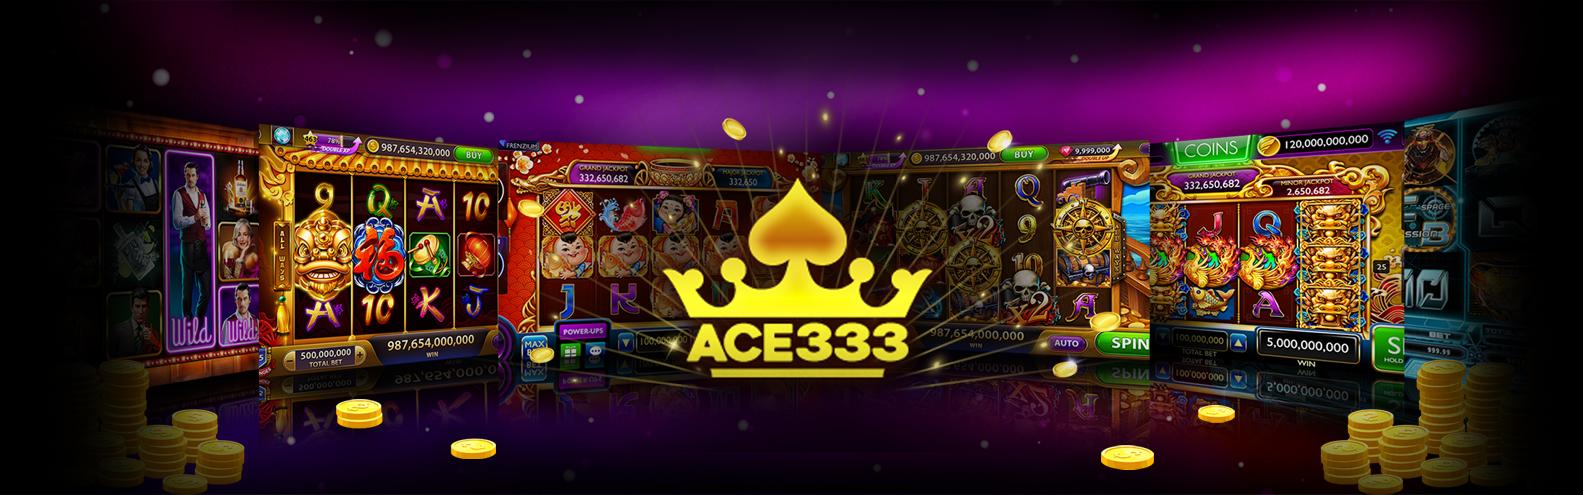 ace333 สมัคร ace333